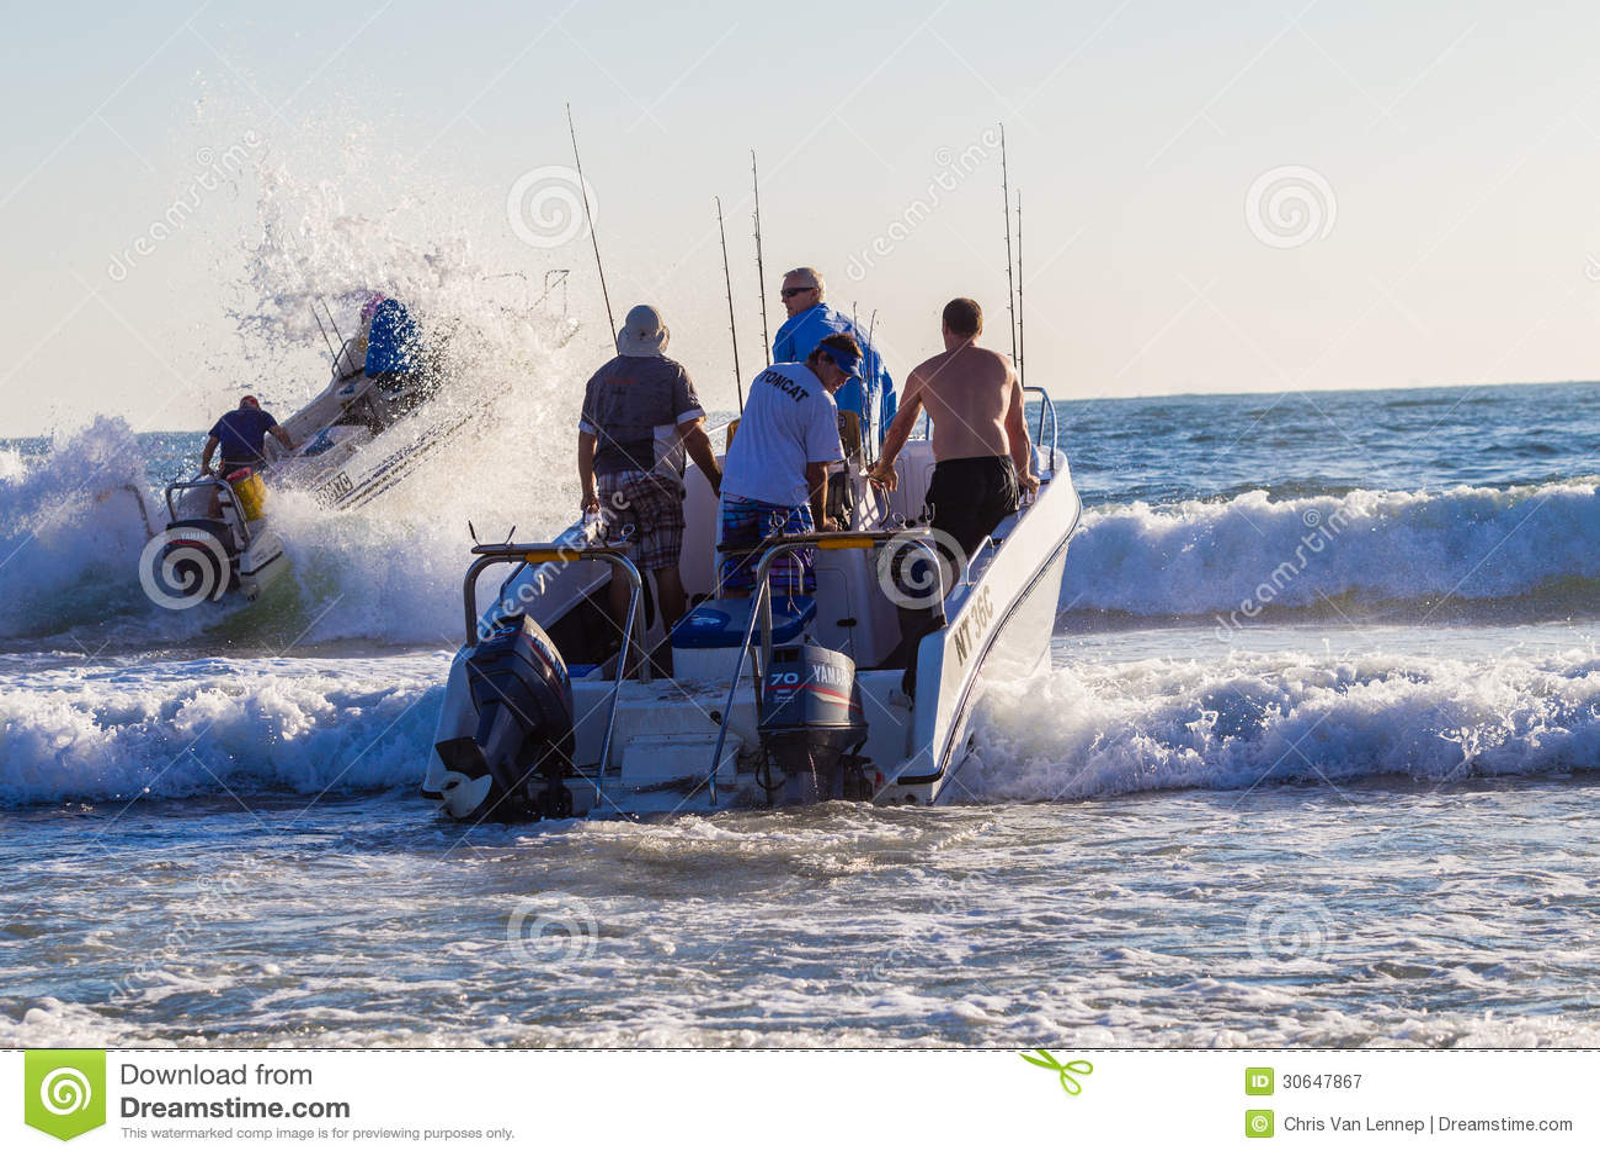 Fishing ski boats waves editorial photography image of for Fish and ski